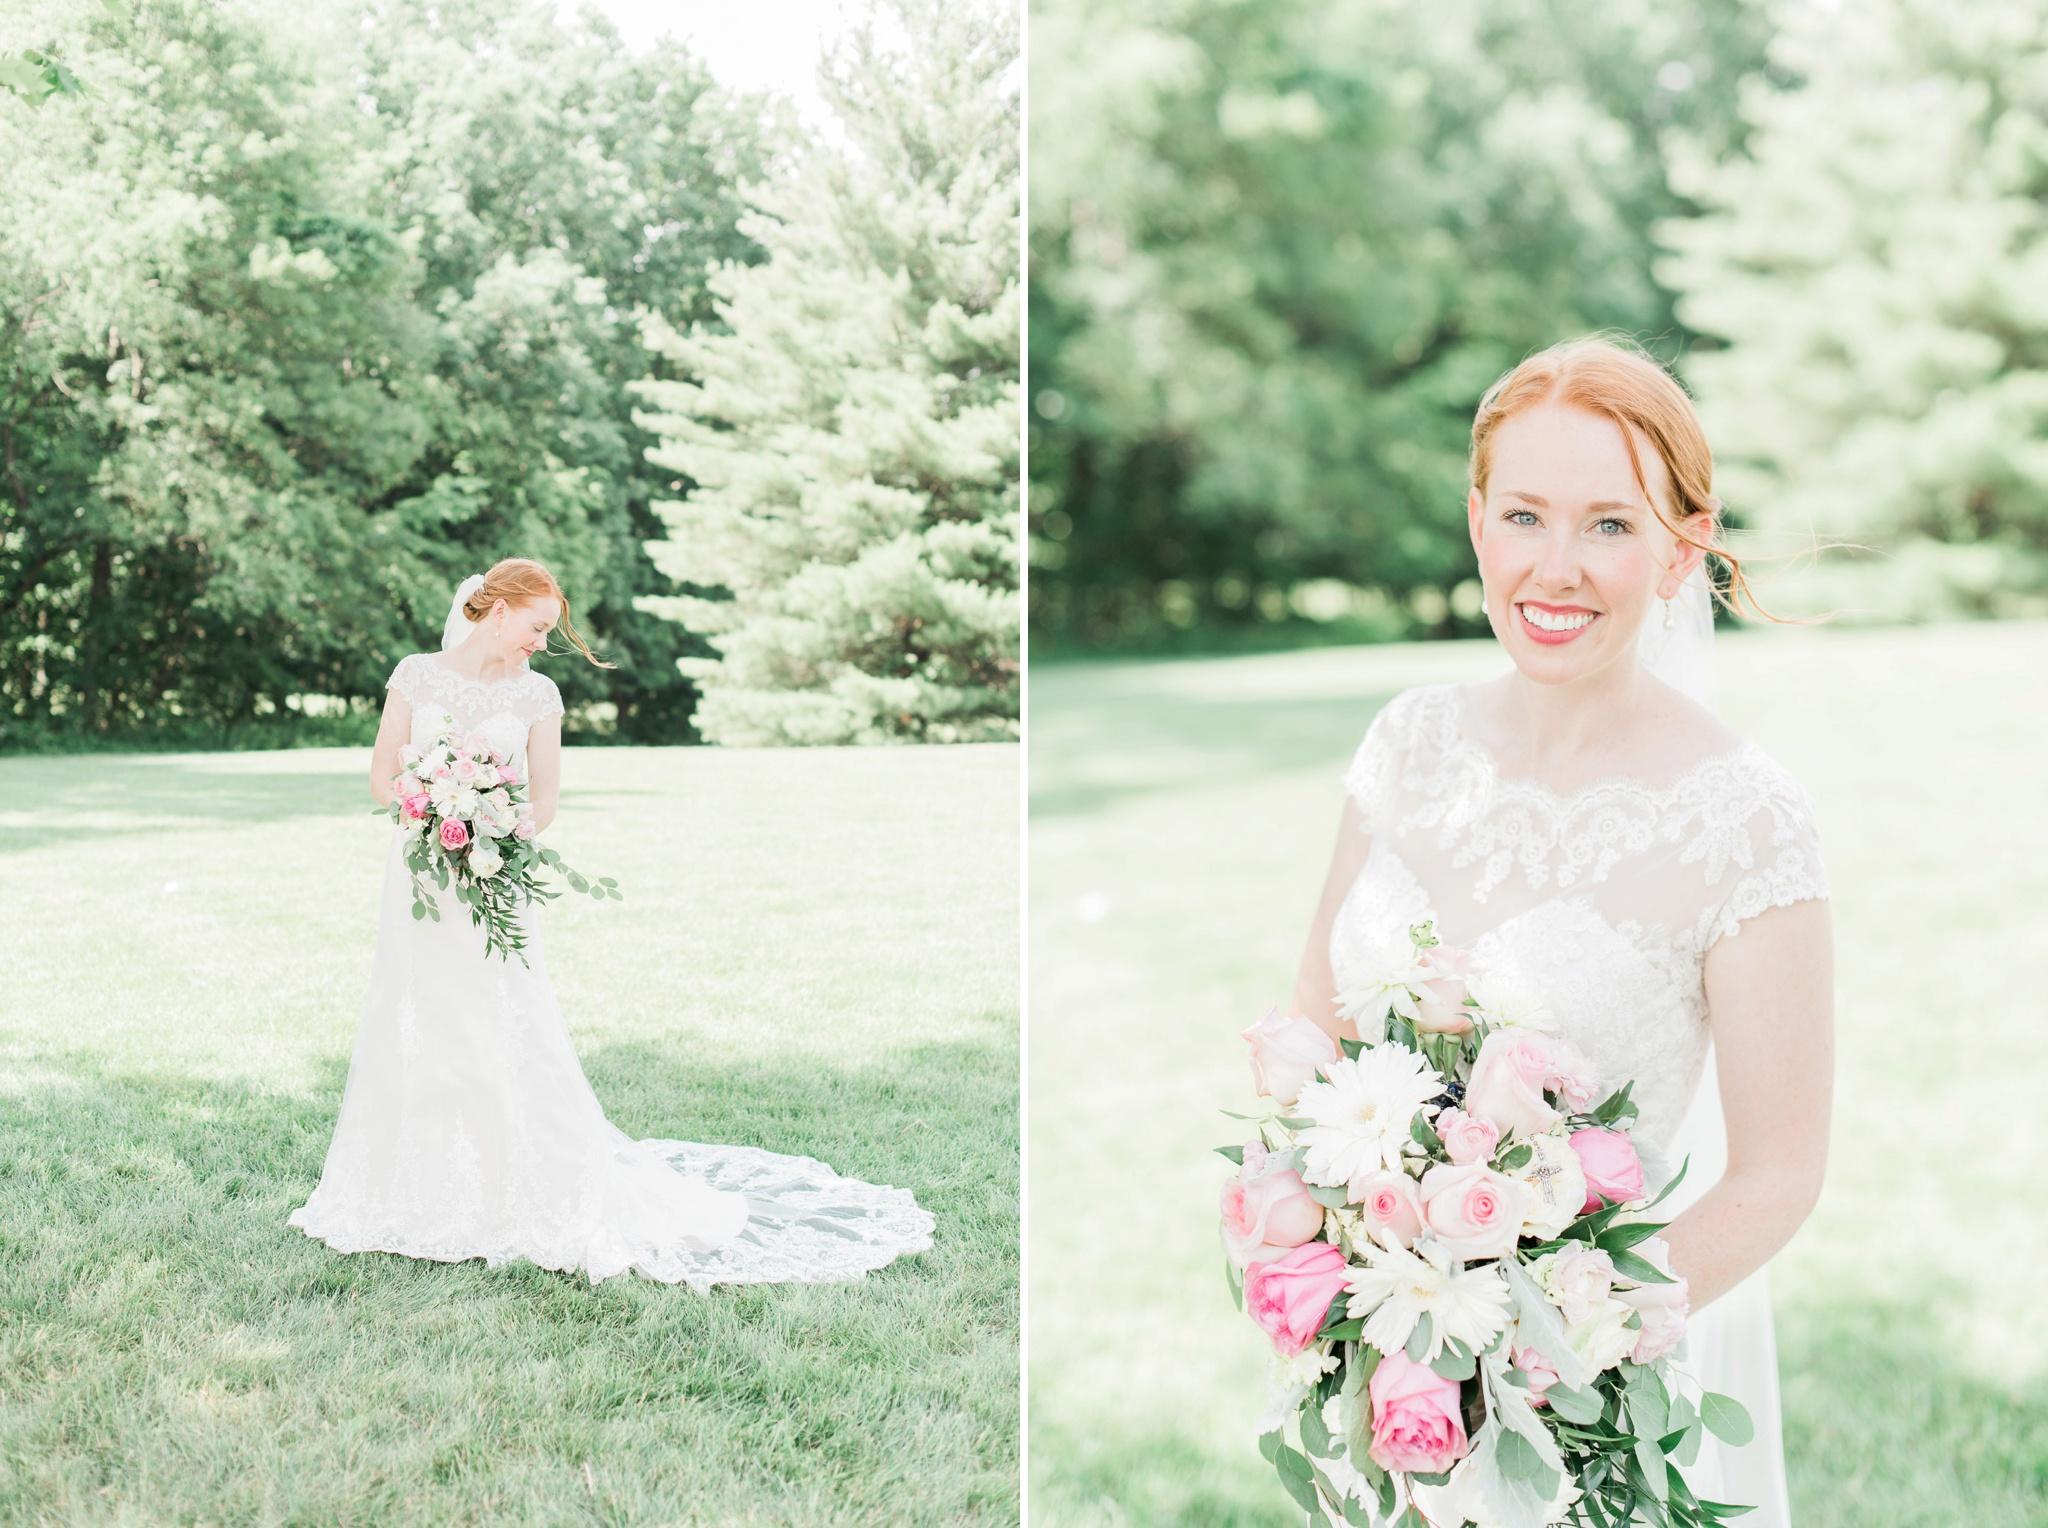 sunbury-ohio-wedding-hannah-johnathan_0054.jpg